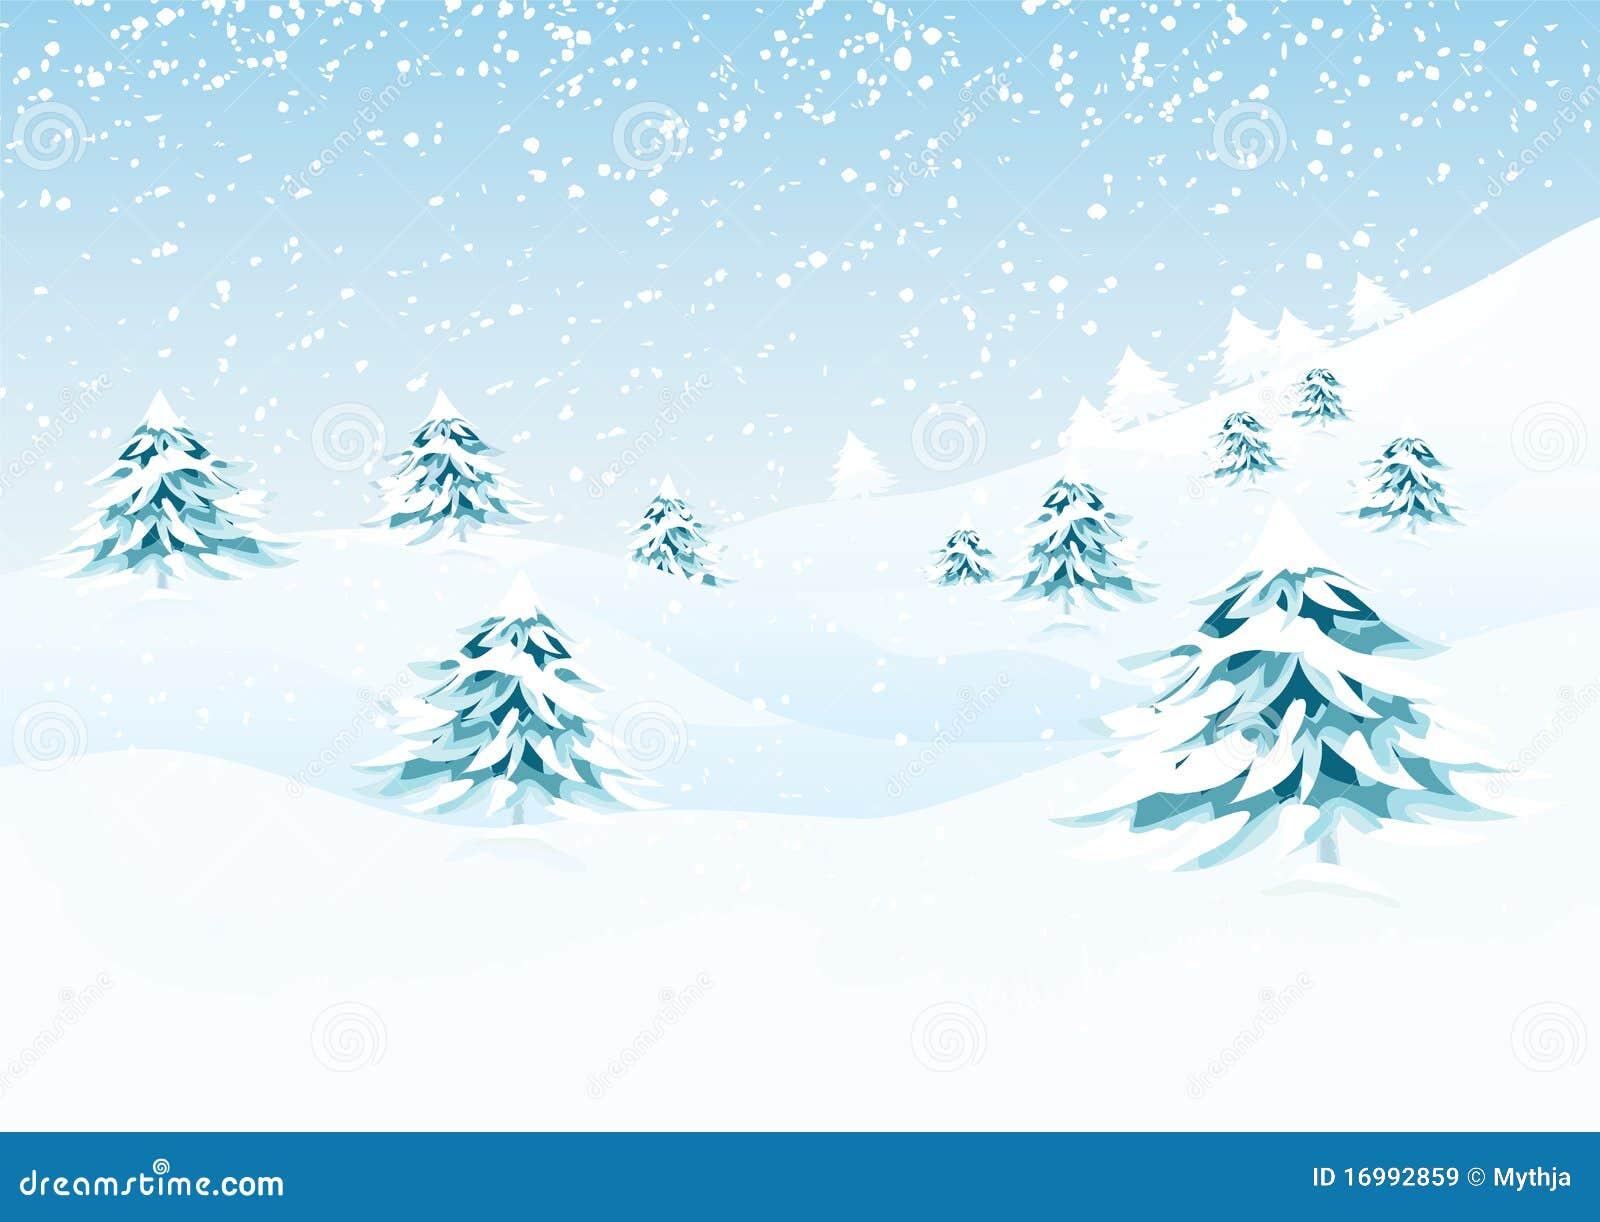 Landscape Illustration Vector Free: Vector Winter Landscape Stock Vector. Illustration Of Cold